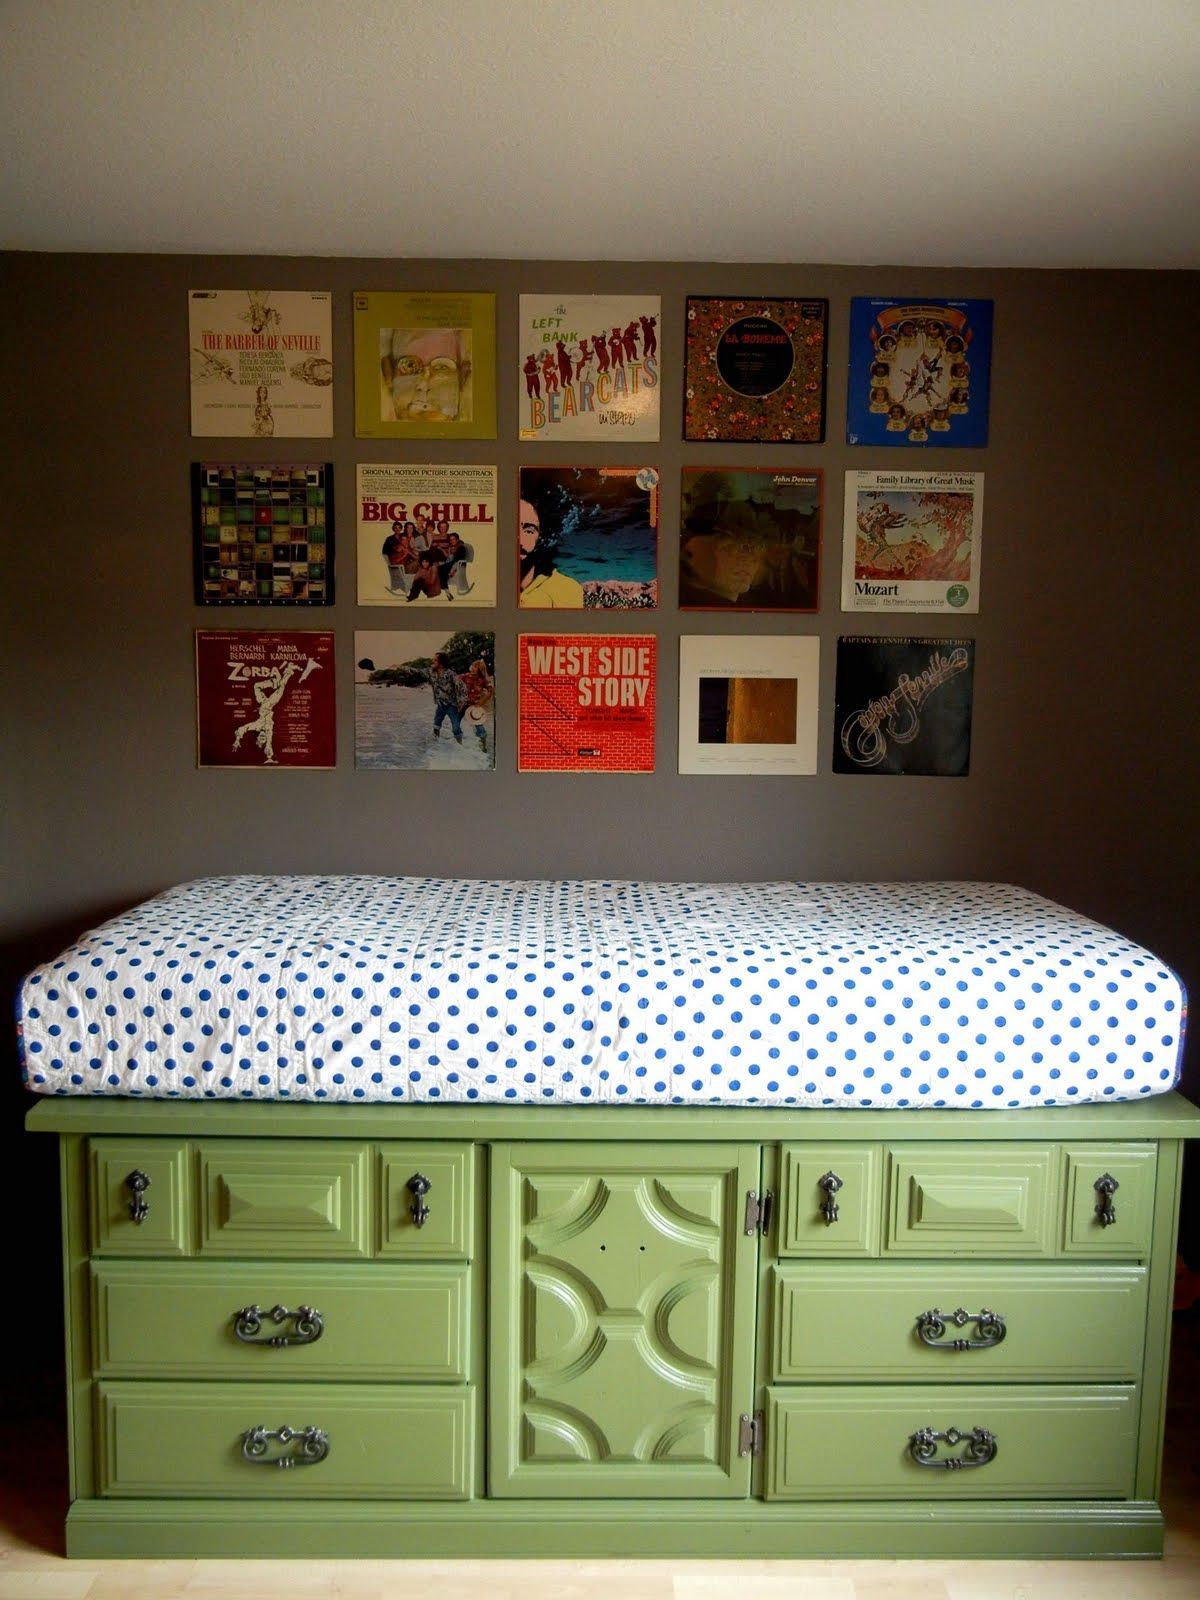 35+ Unique Inspiration DIY Bed Frame Ideas Easy To Upgrade